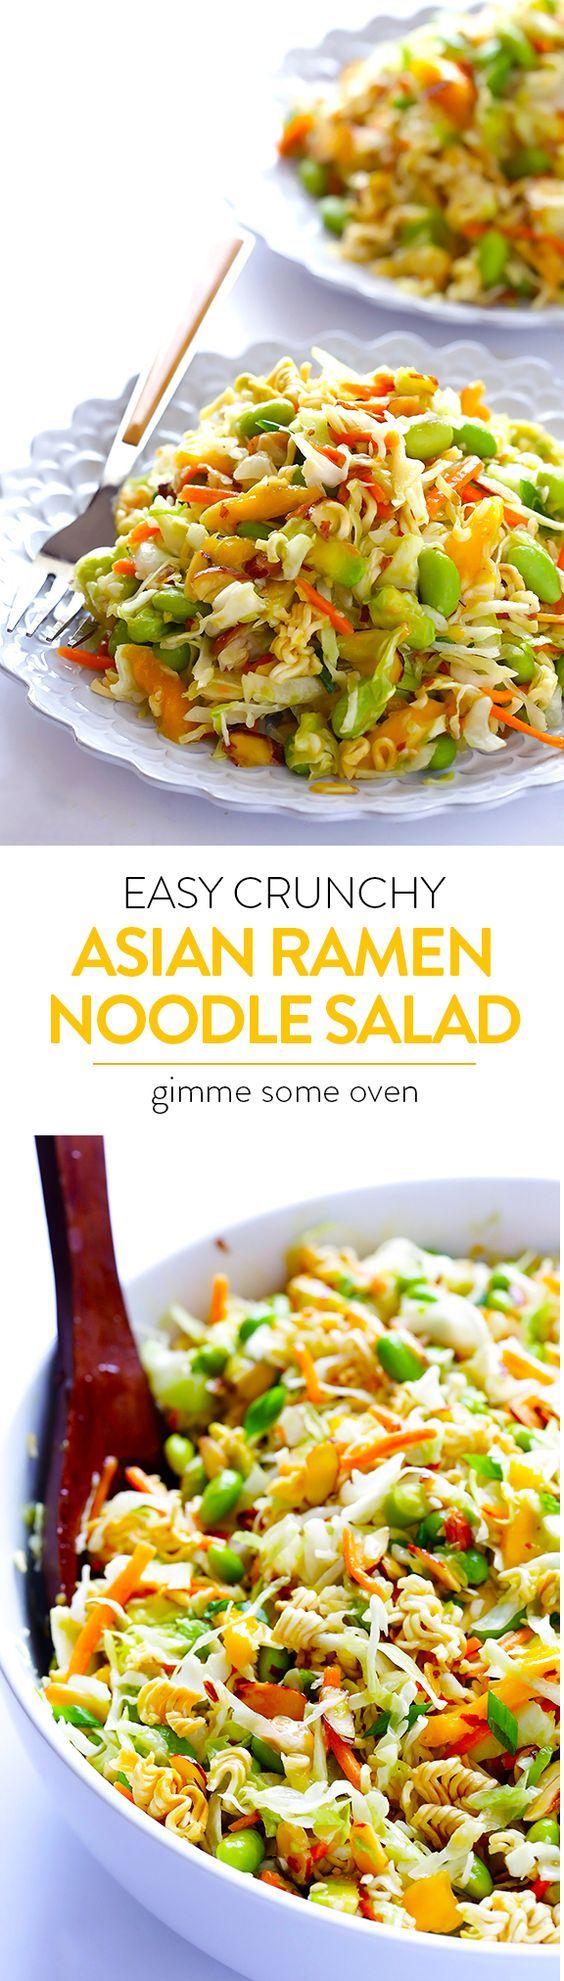 CRUNCHY ASIAN RAMEN NOODLE SALAD 10 min to make, serves eight!